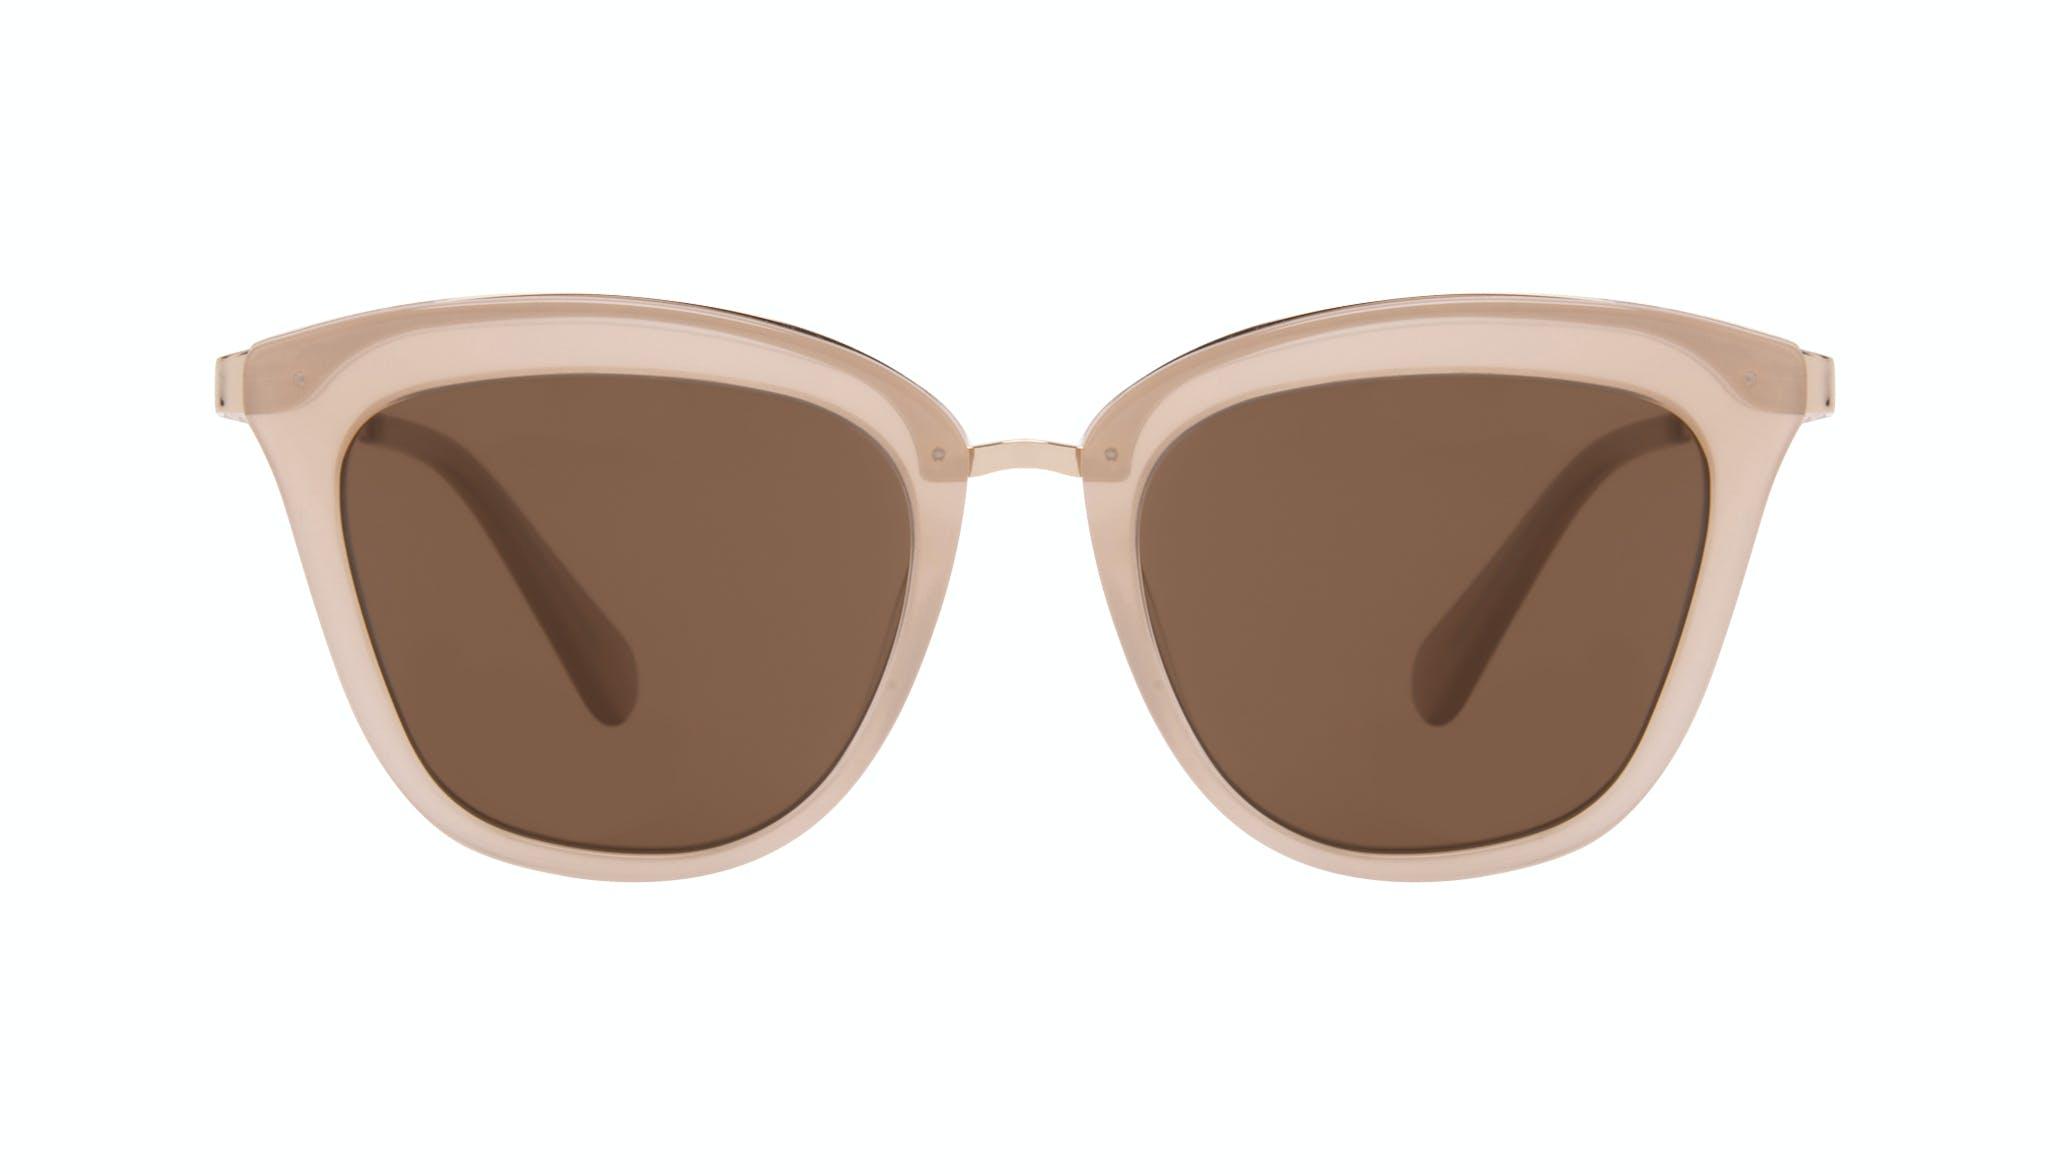 Affordable Fashion Glasses Cat Eye Sunglasses Women More Petite Bone